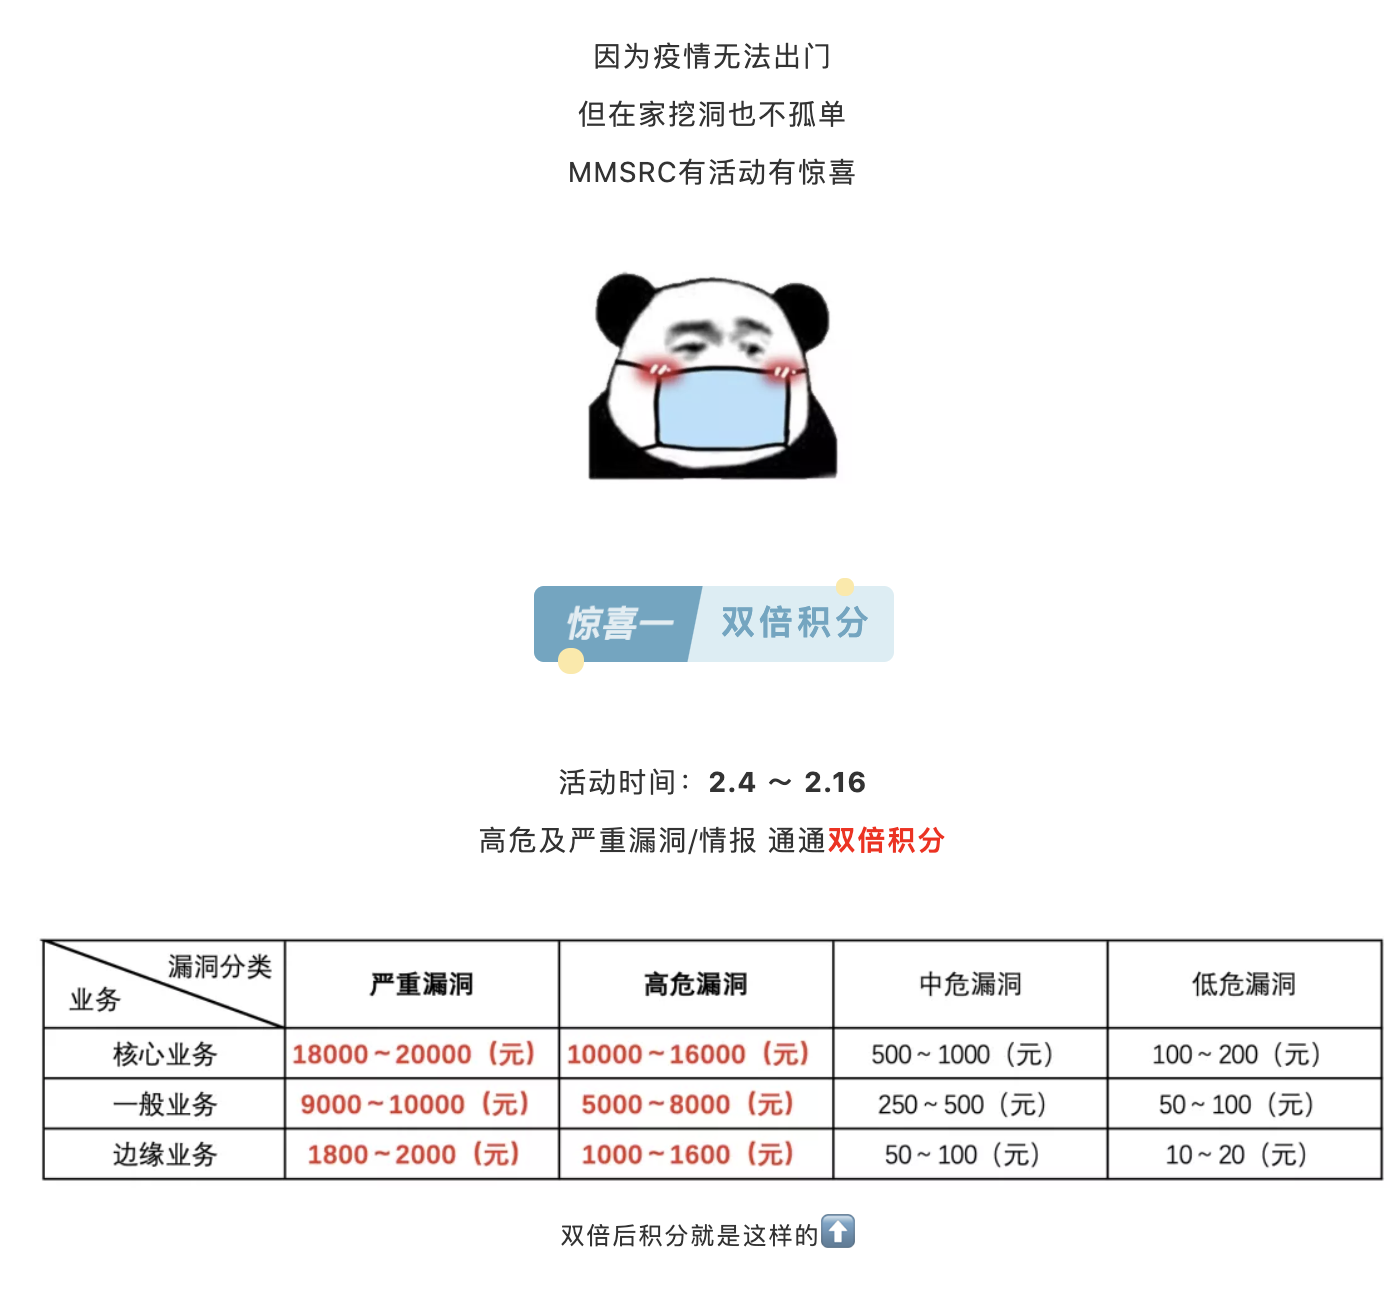 https://momo-mmsrc.oss-cn-hangzhou.aliyuncs.com/img-f97895c0-1feb-3561-8661-938eb2862195.png